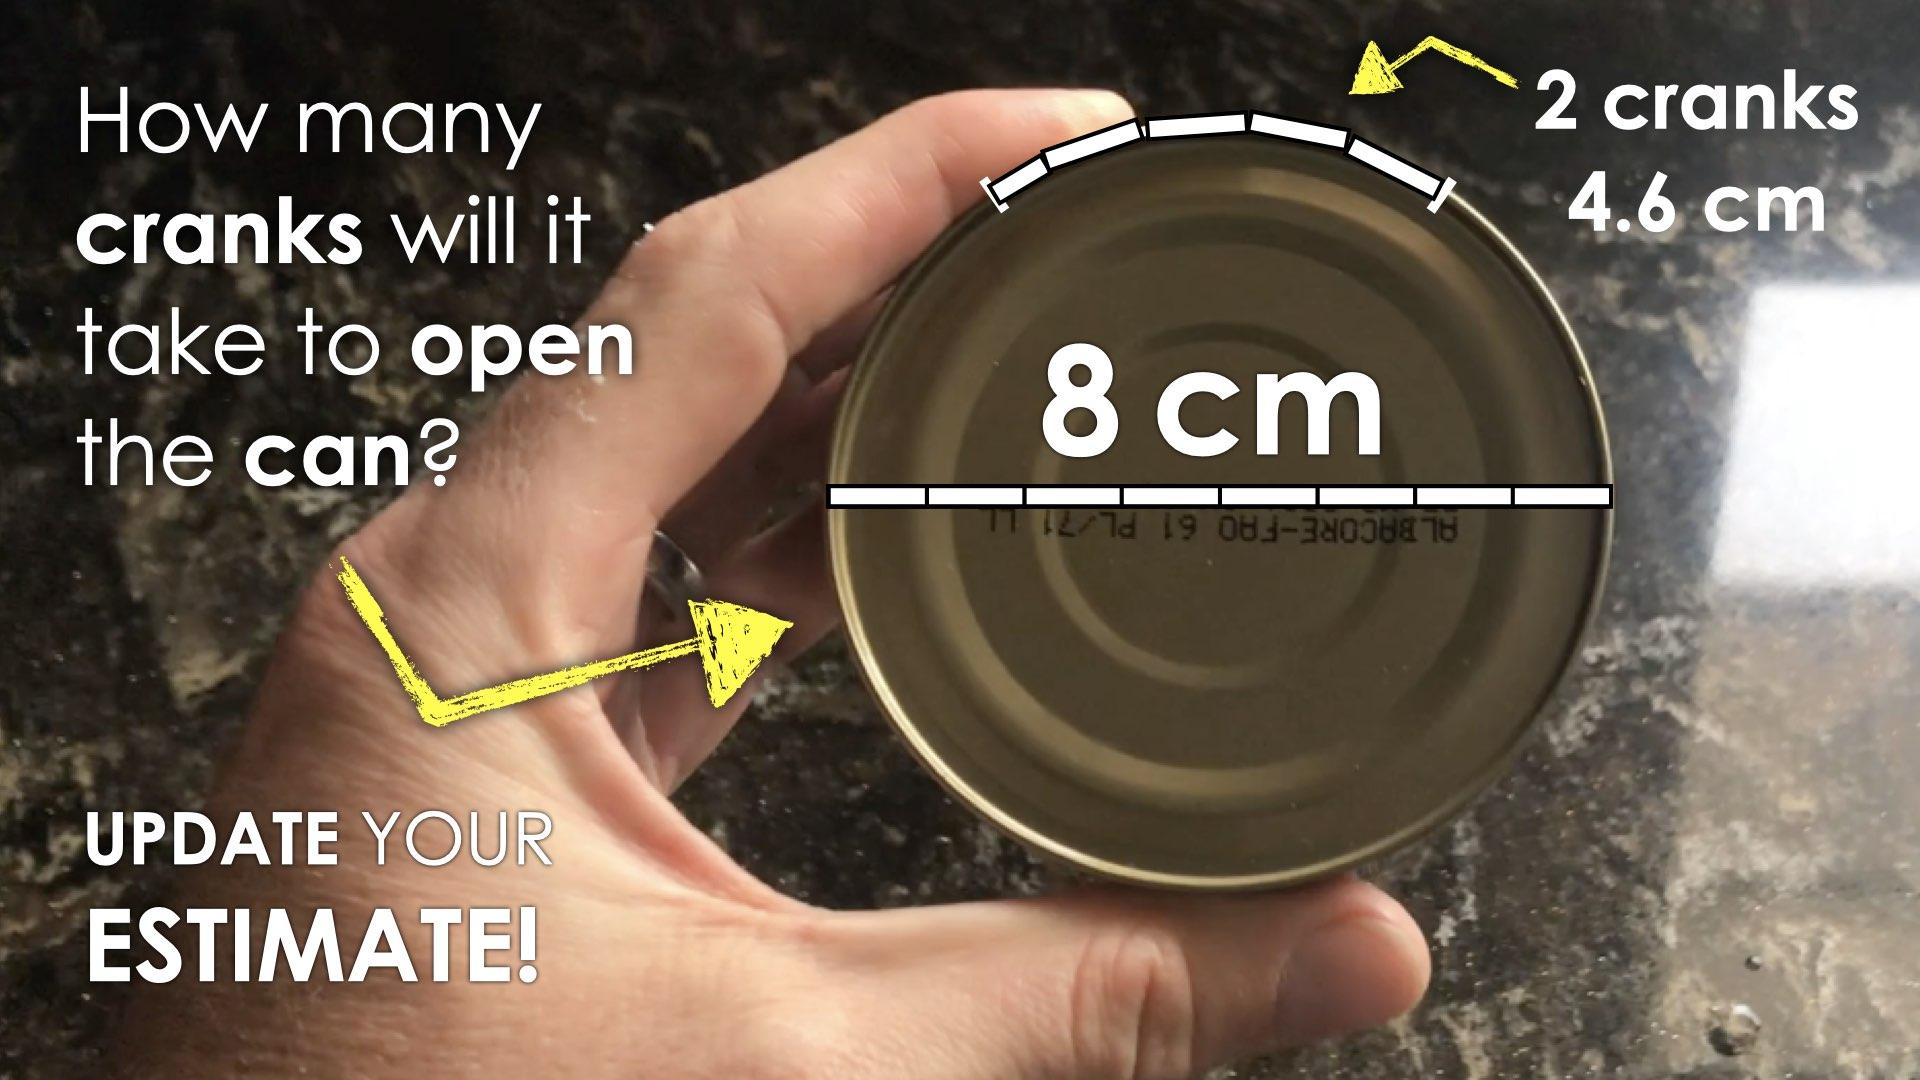 Open Sesame - 4 - Sense Making - Craft A Productive Struggle - Info to Update Estimate